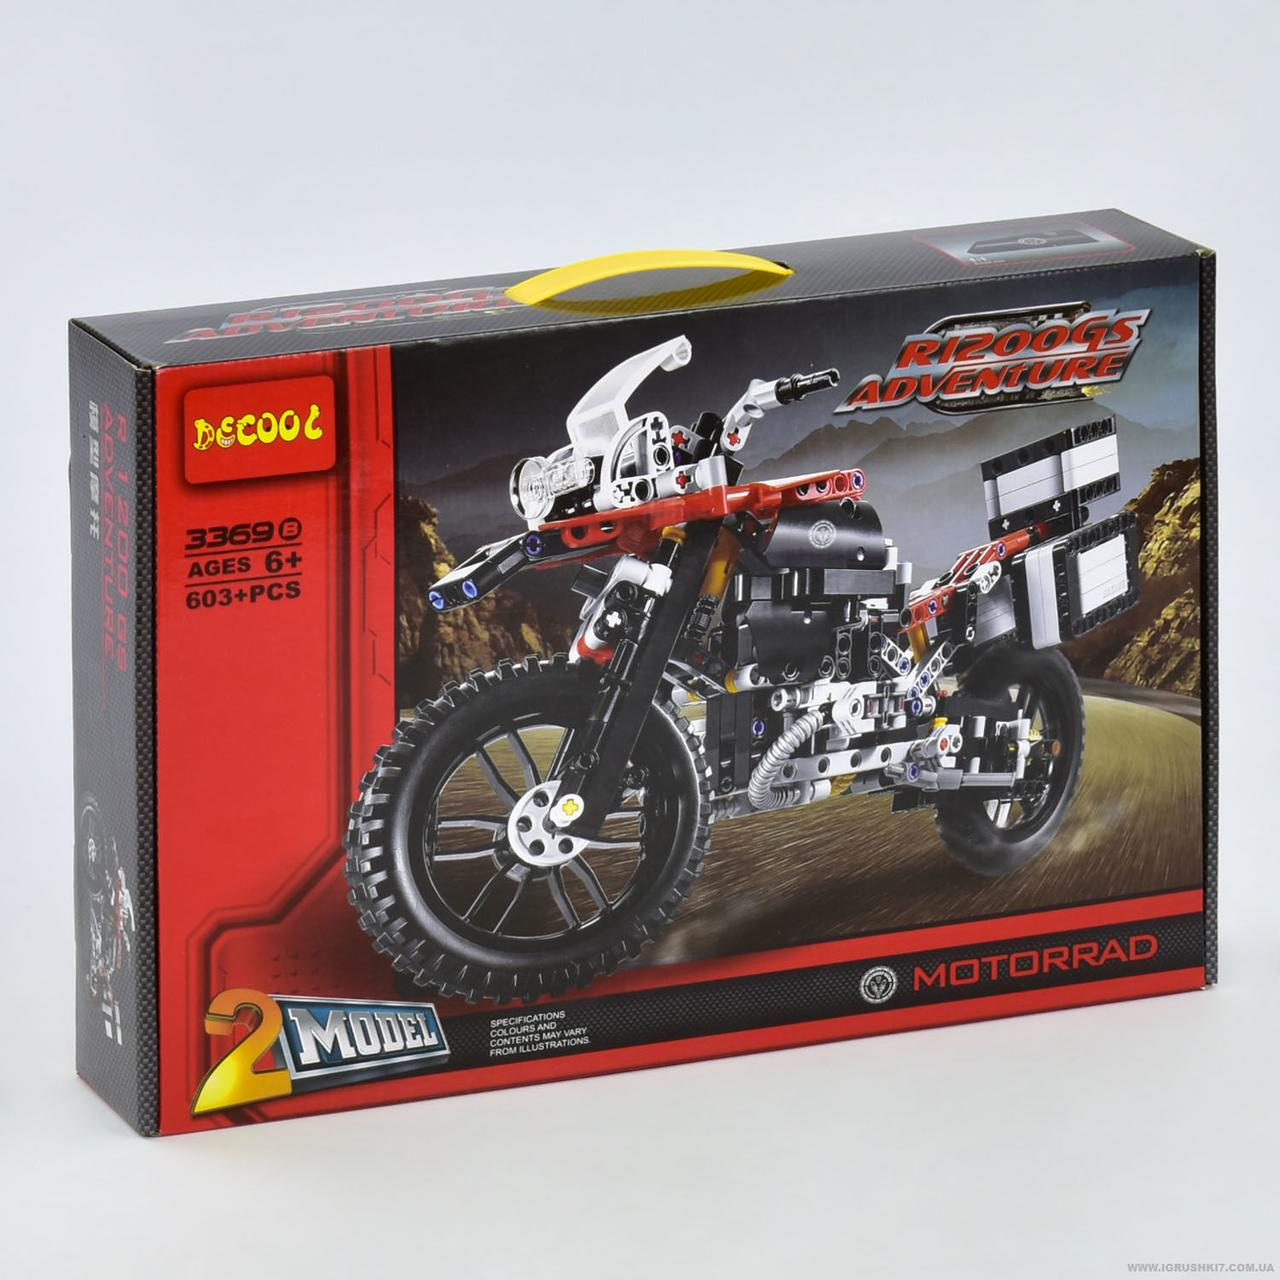 Конструктор 3369 B Decool Мотоцикл 603 детали